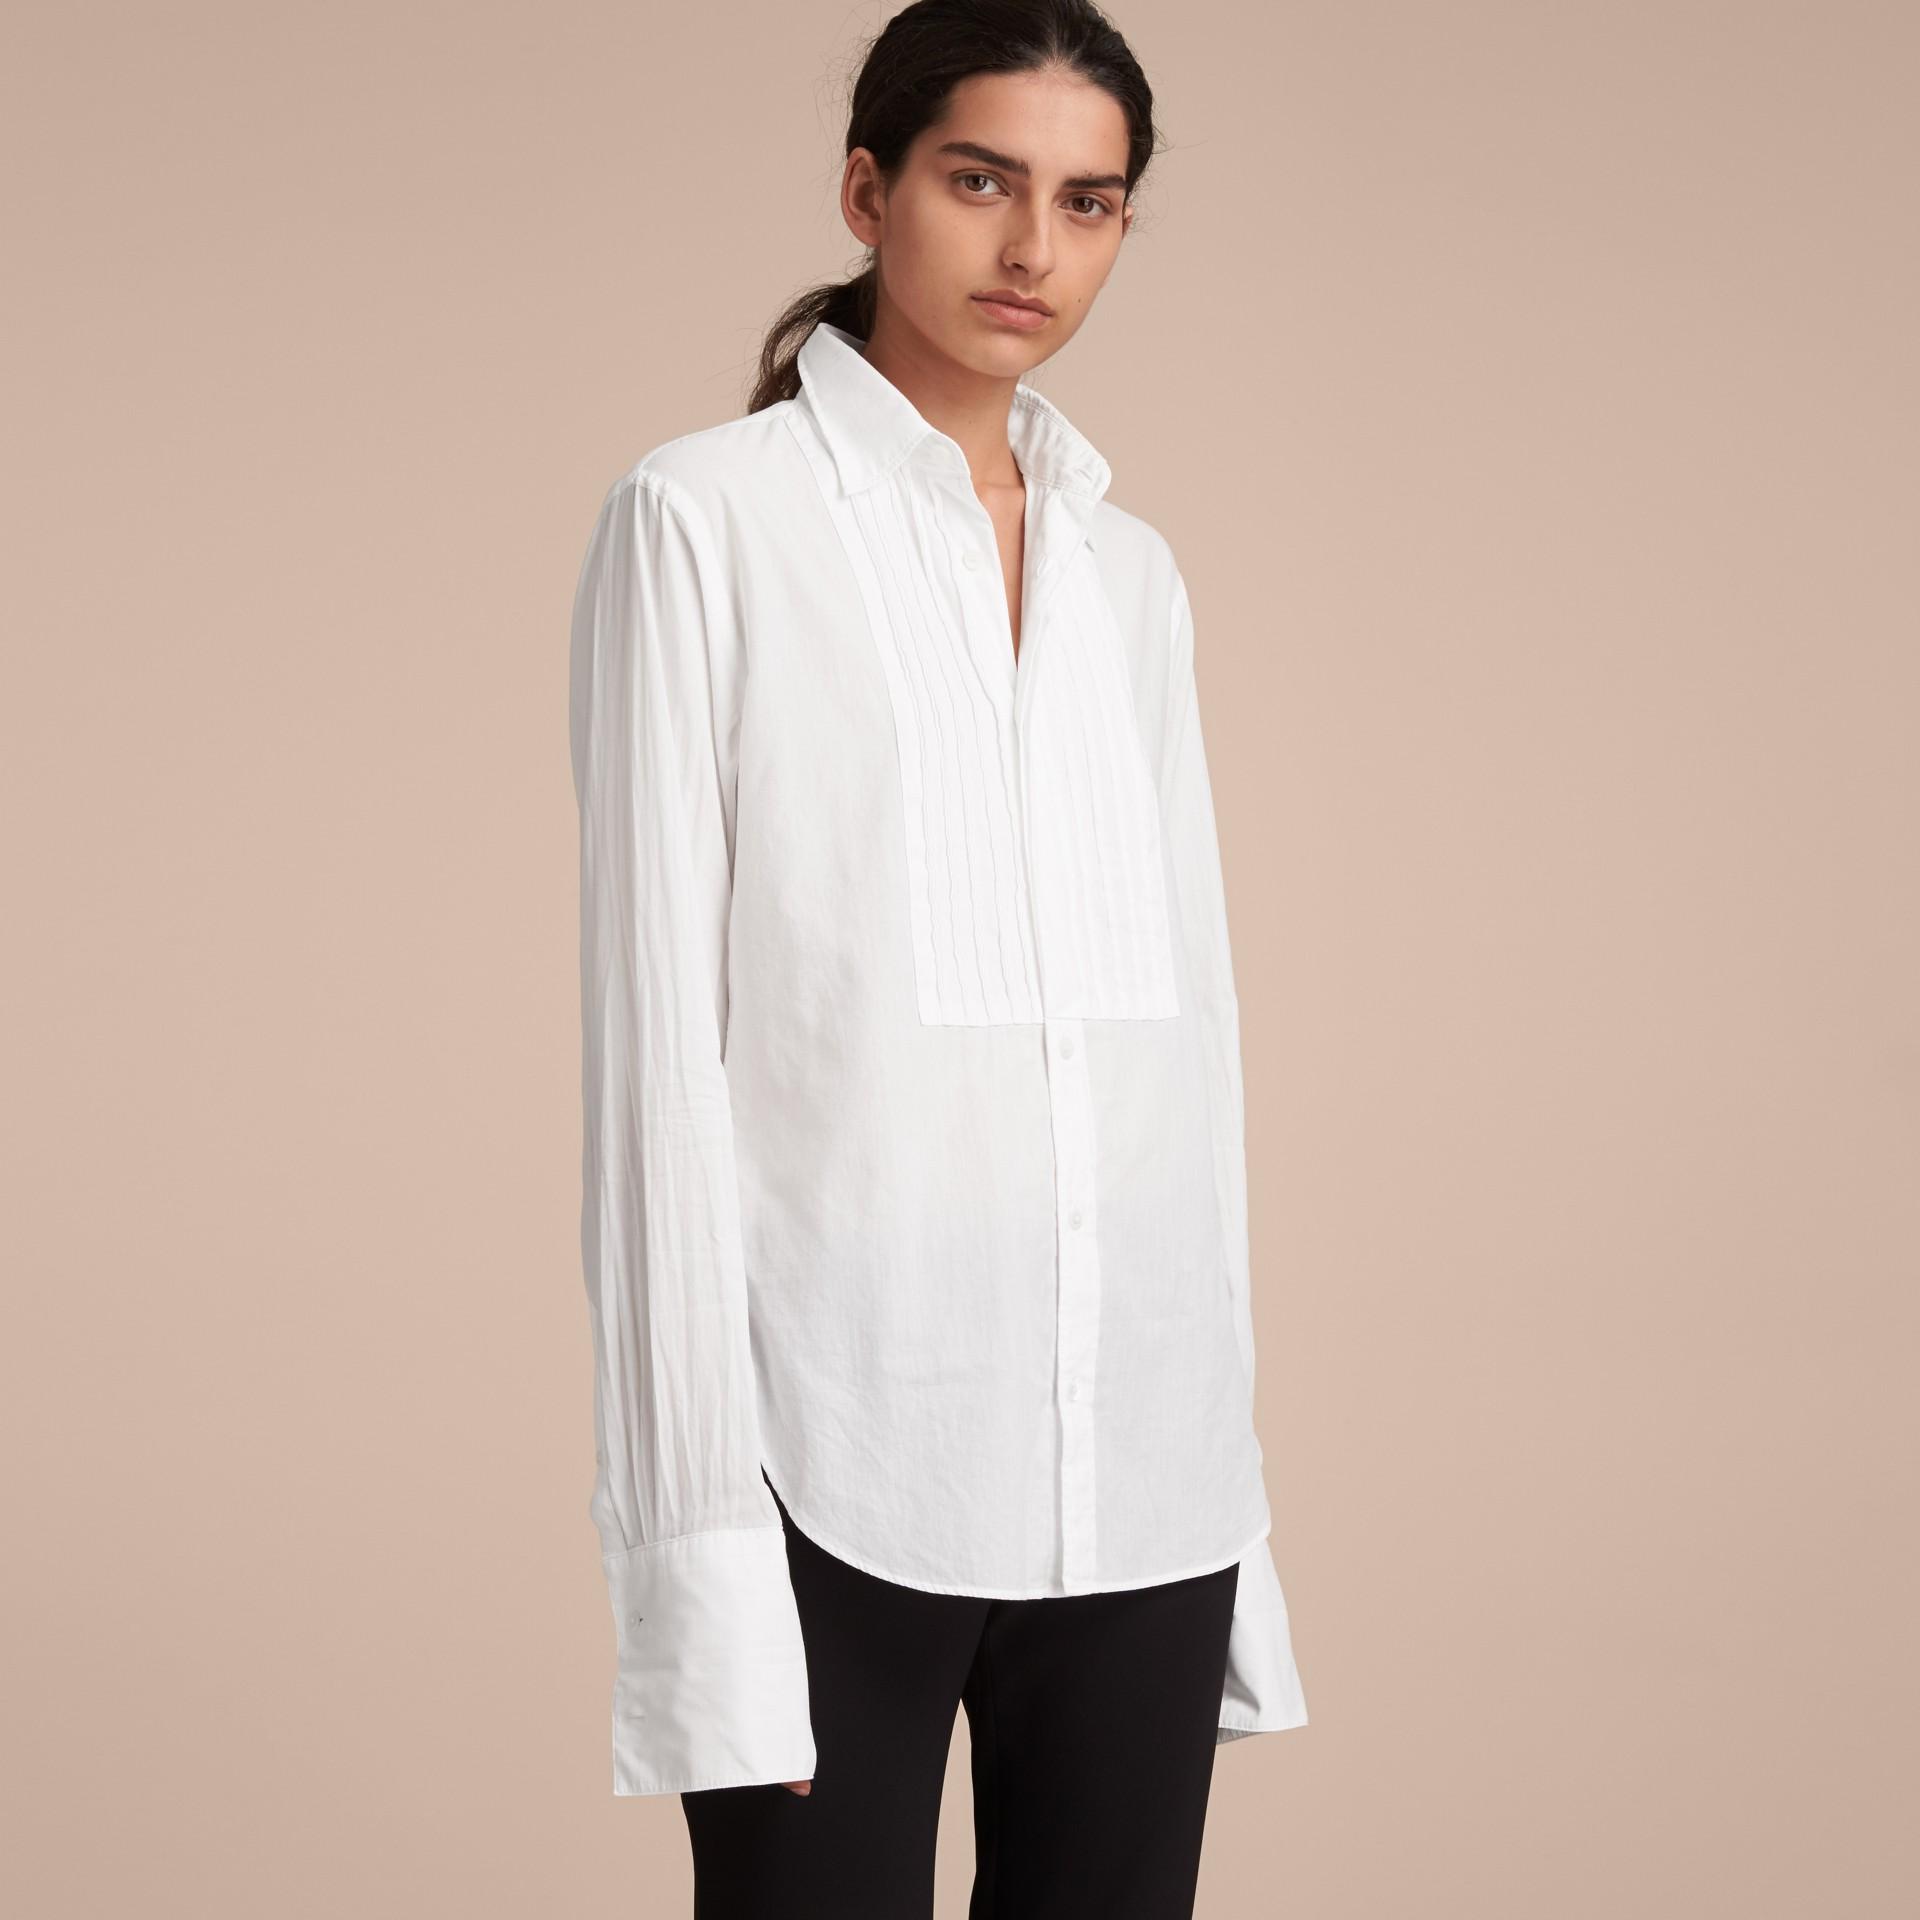 Unisex Double-cuff Pintuck Bib Cotton Shirt White - gallery image 6